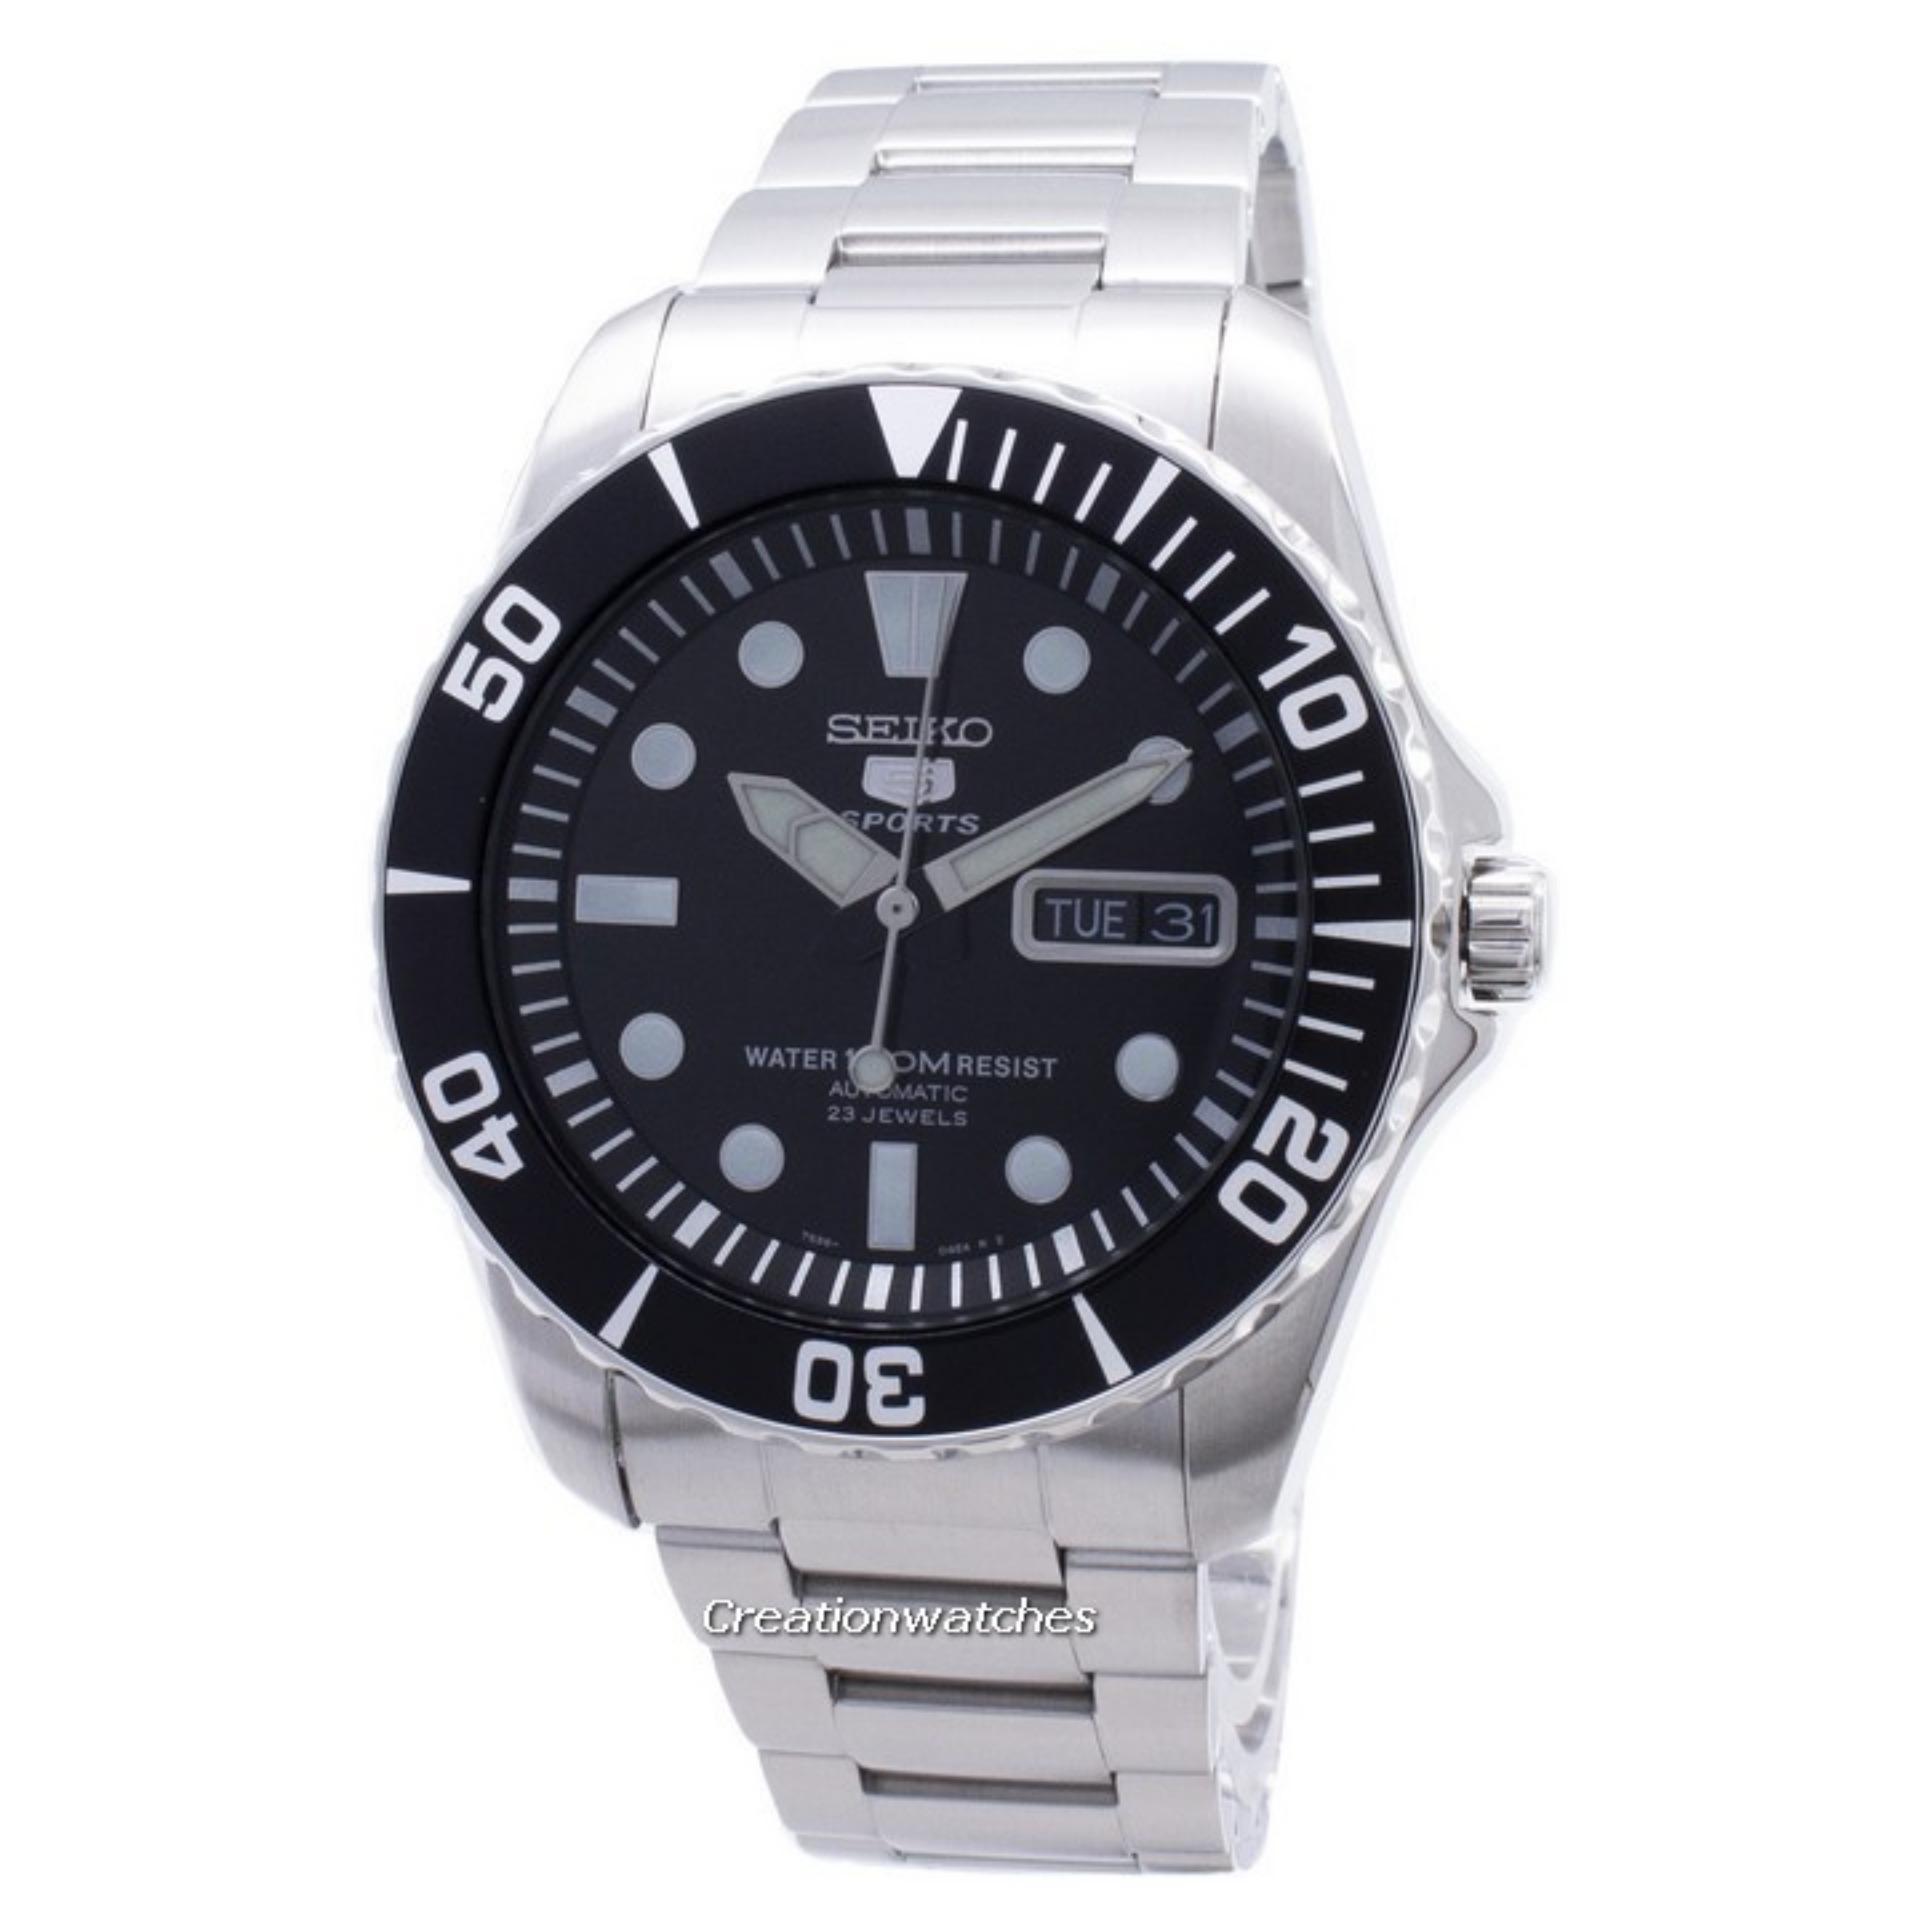 2817c0cd0 Seiko 5 Sports Automatic 23 Jewels Men's Silver Stainless Steel Bracelet  Watch SNZF17K1